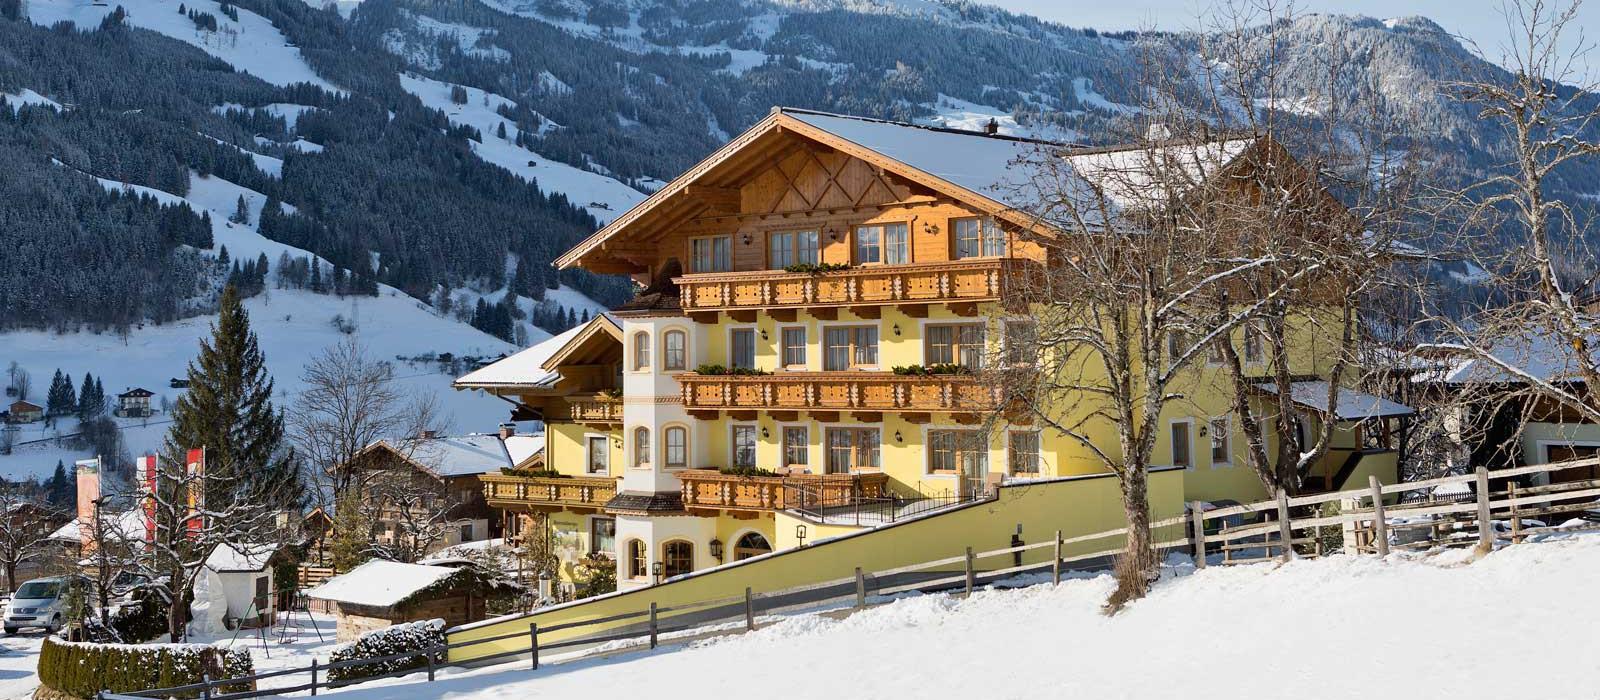 Winterurlaub im Untermüllnergut im Salzburgerland